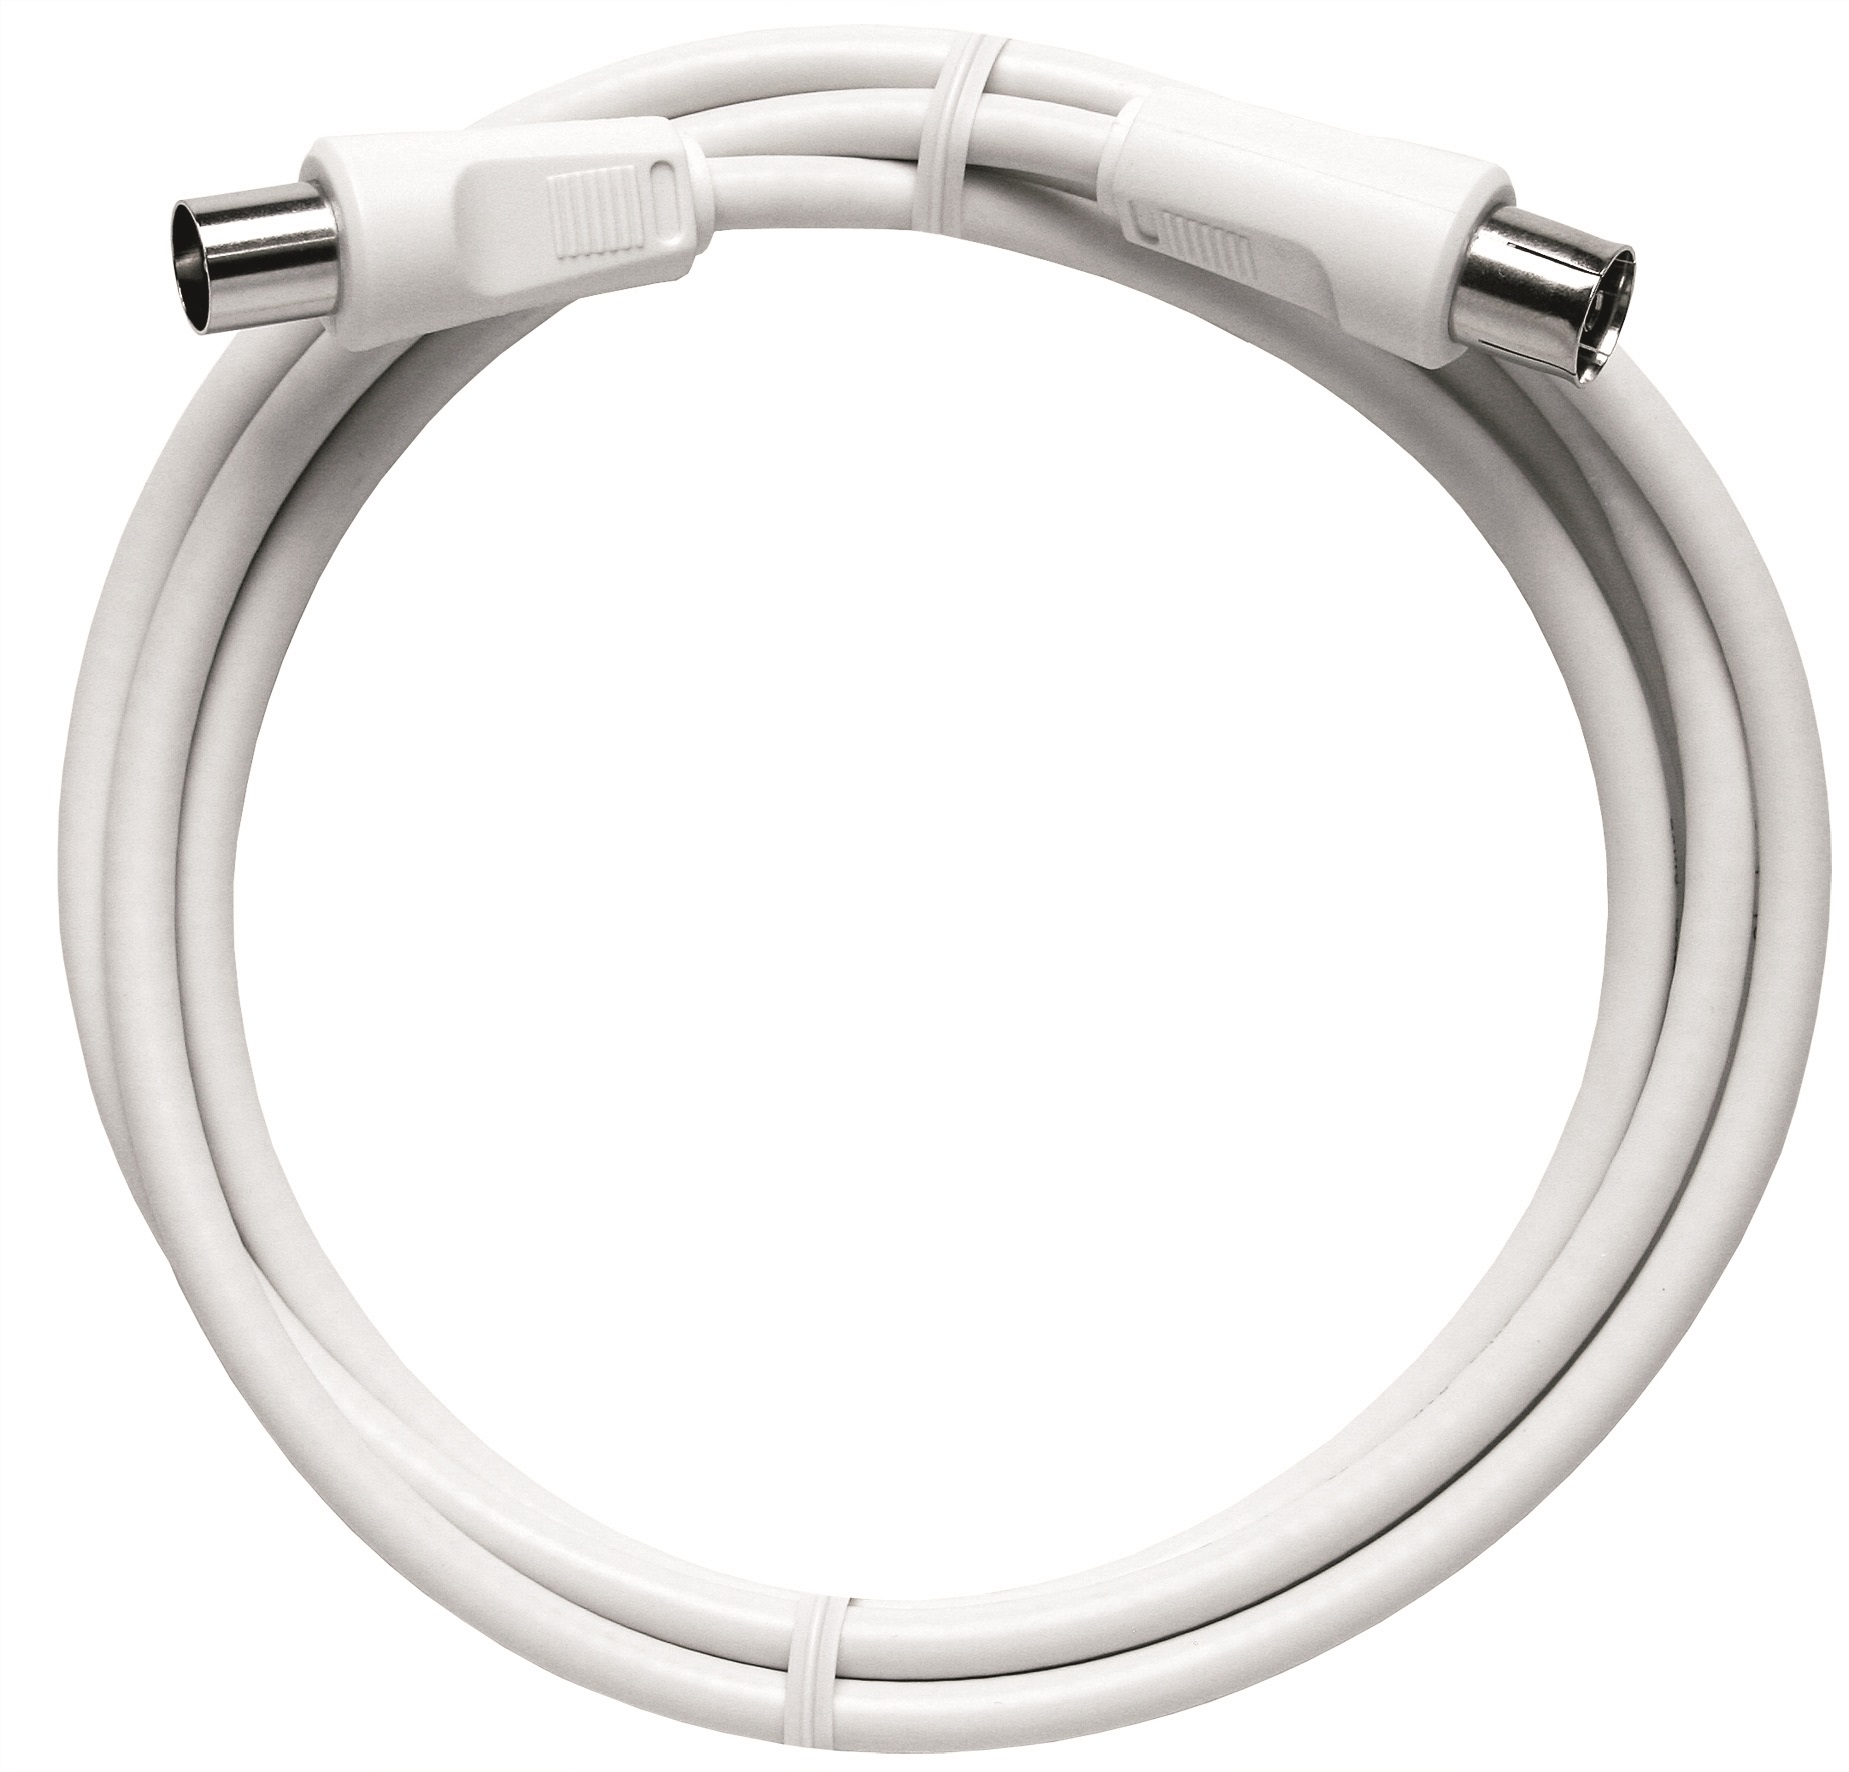 1 Stk BK Koax Patchkabel IEC-M/IEC-F,ger.,Cl.A,ws, 5,0m,BAK 500-90 HSBKPIG5K0